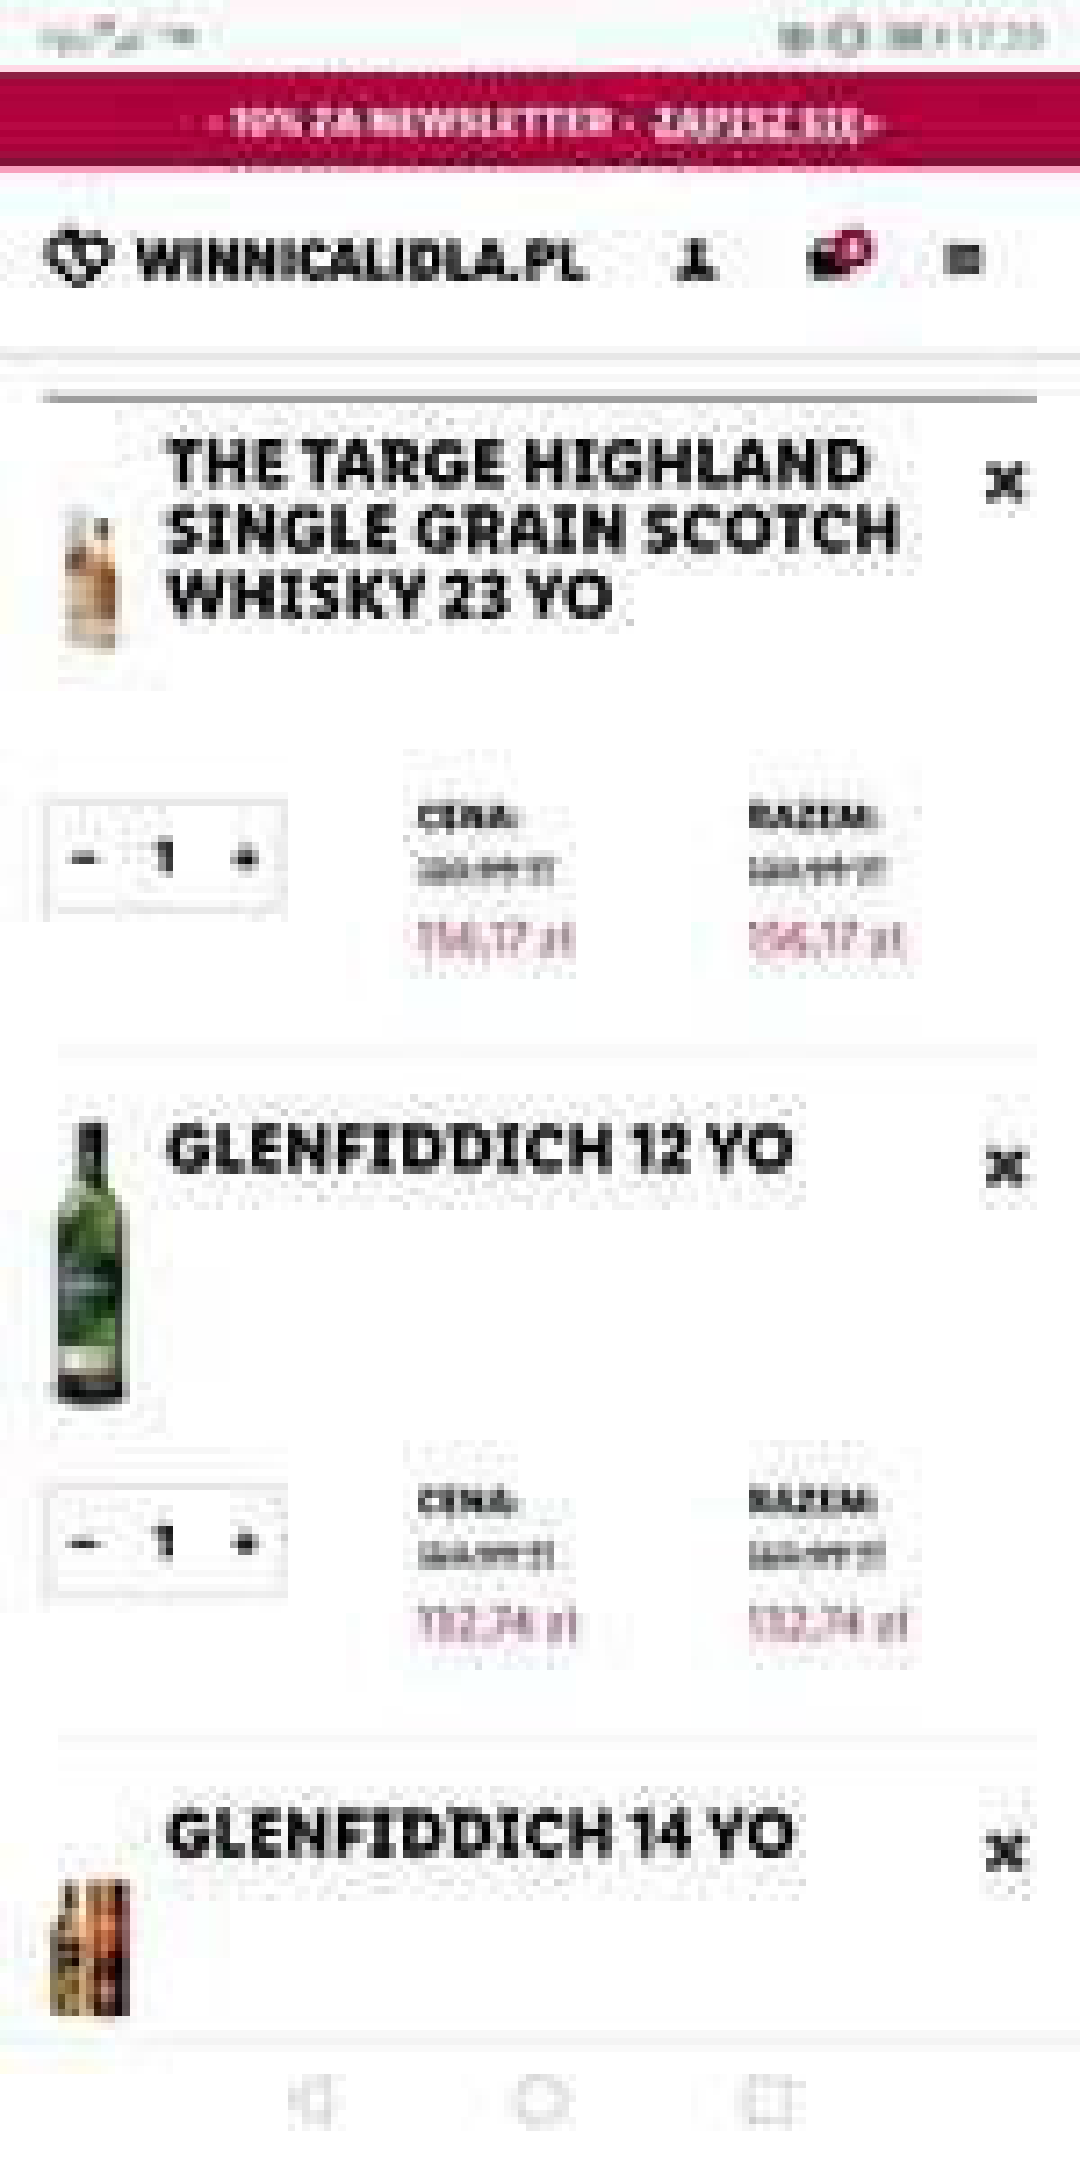 Whisky 23 yo THE TARGE HIGHLAND Single Grain - WINNICA LIDLA